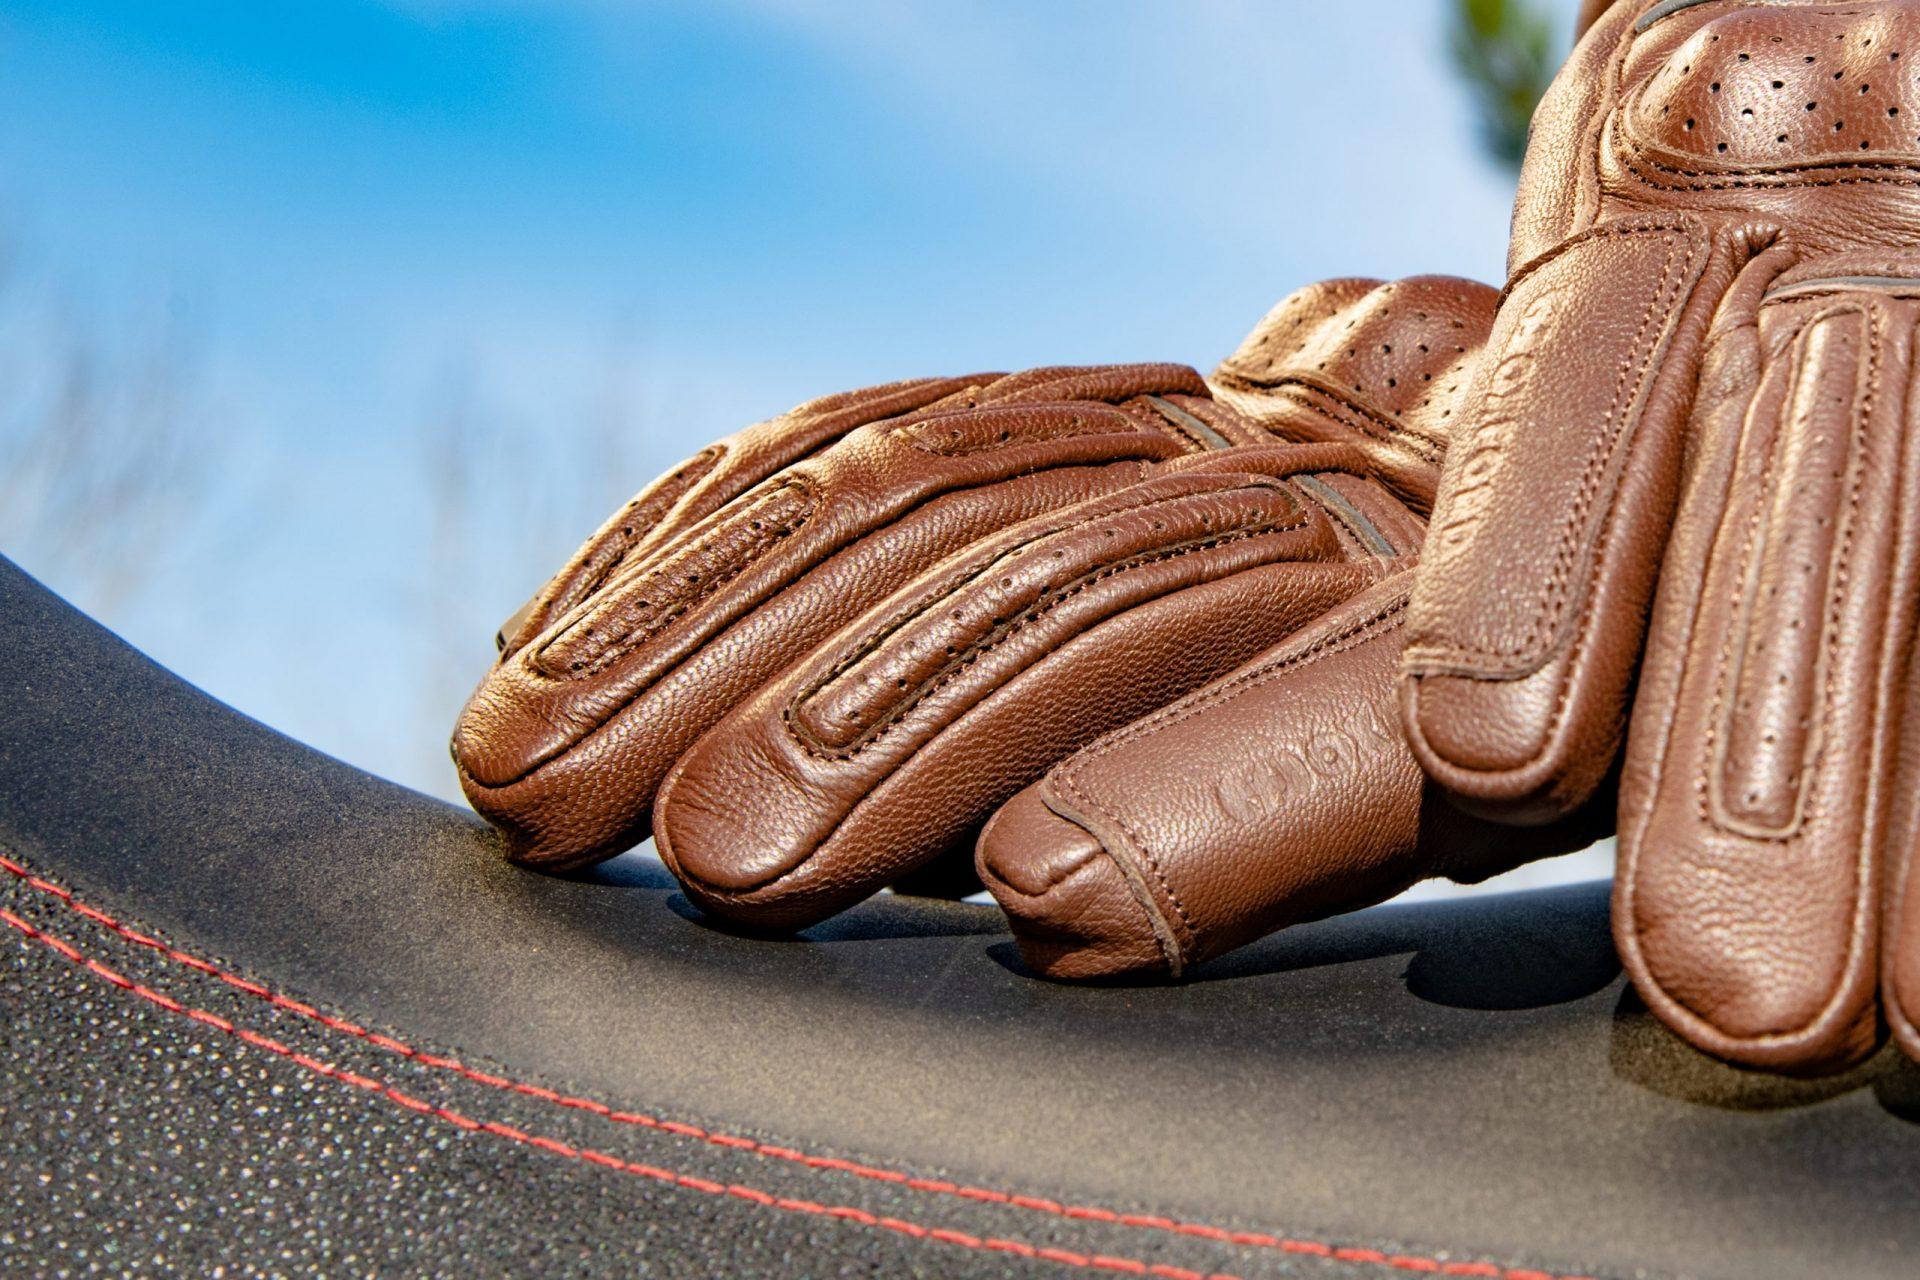 GM197202-Hamilton-MS-Glove-Brown-3-scaled Hamilton Dry2Dry™ Winter Gloves